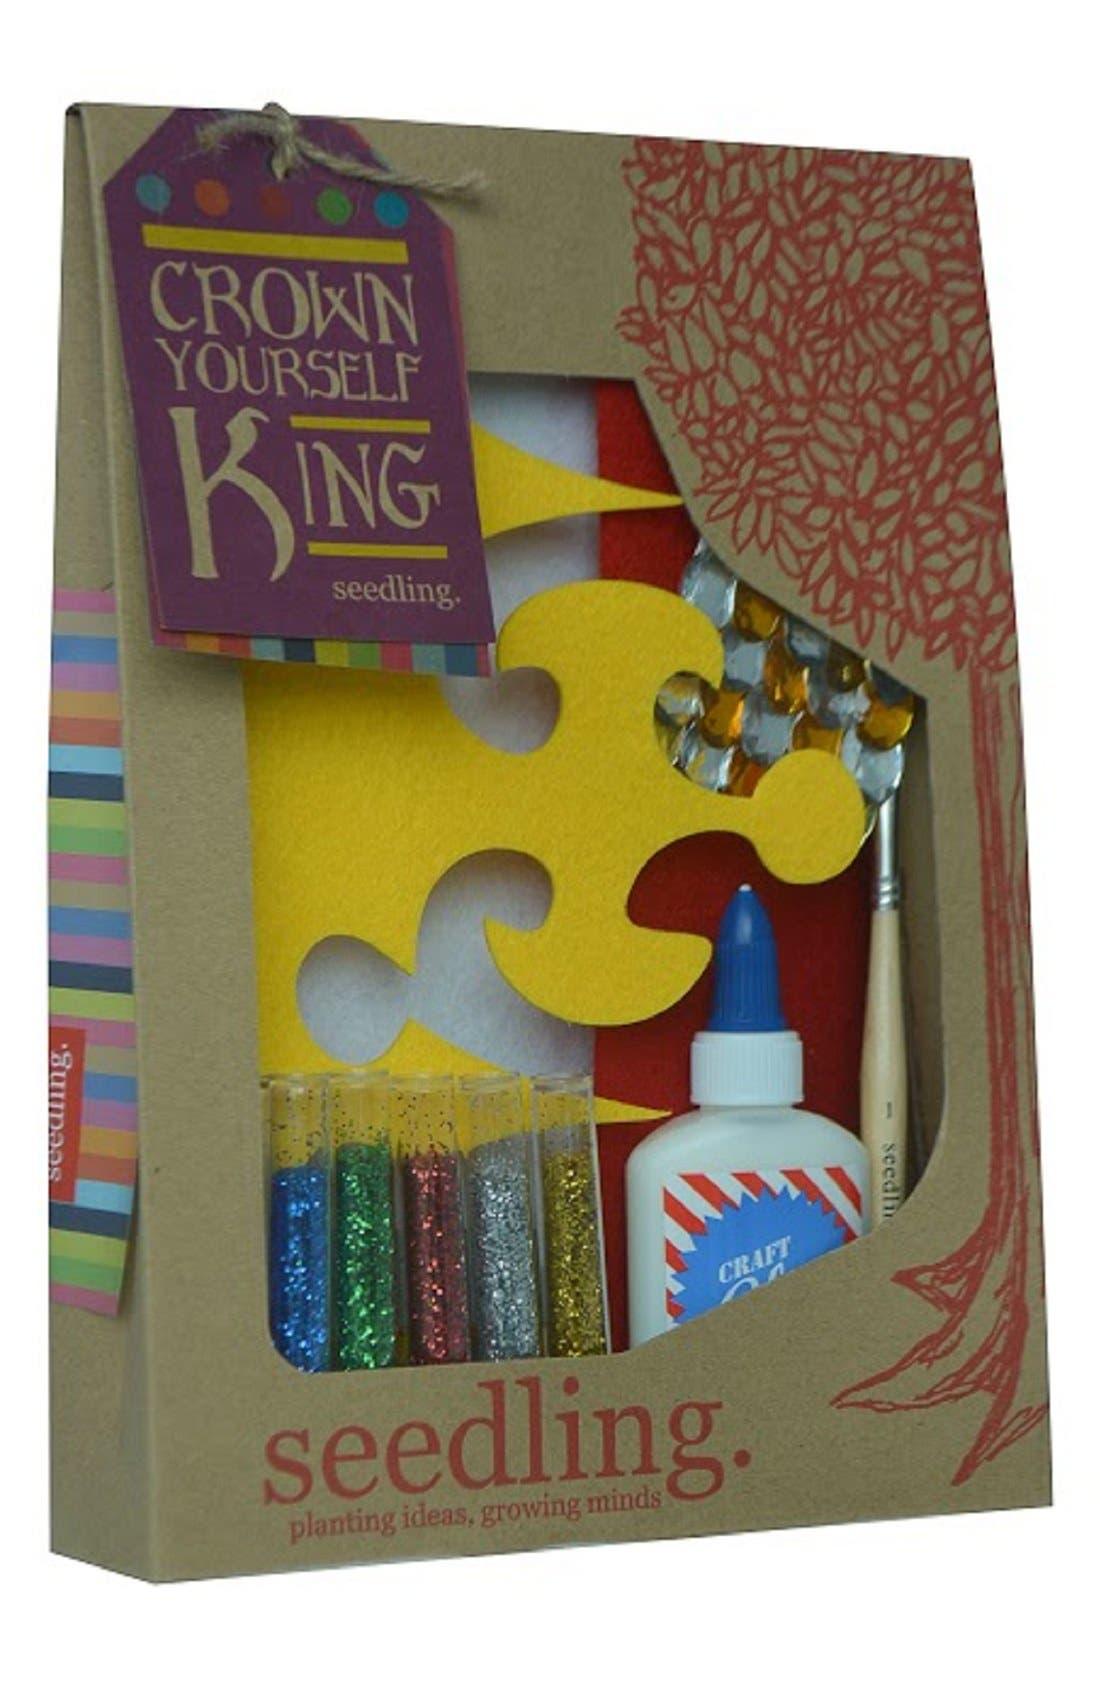 Alternate Image 1 Selected - seedling 'Crown Yourself King' DIY Craft Set